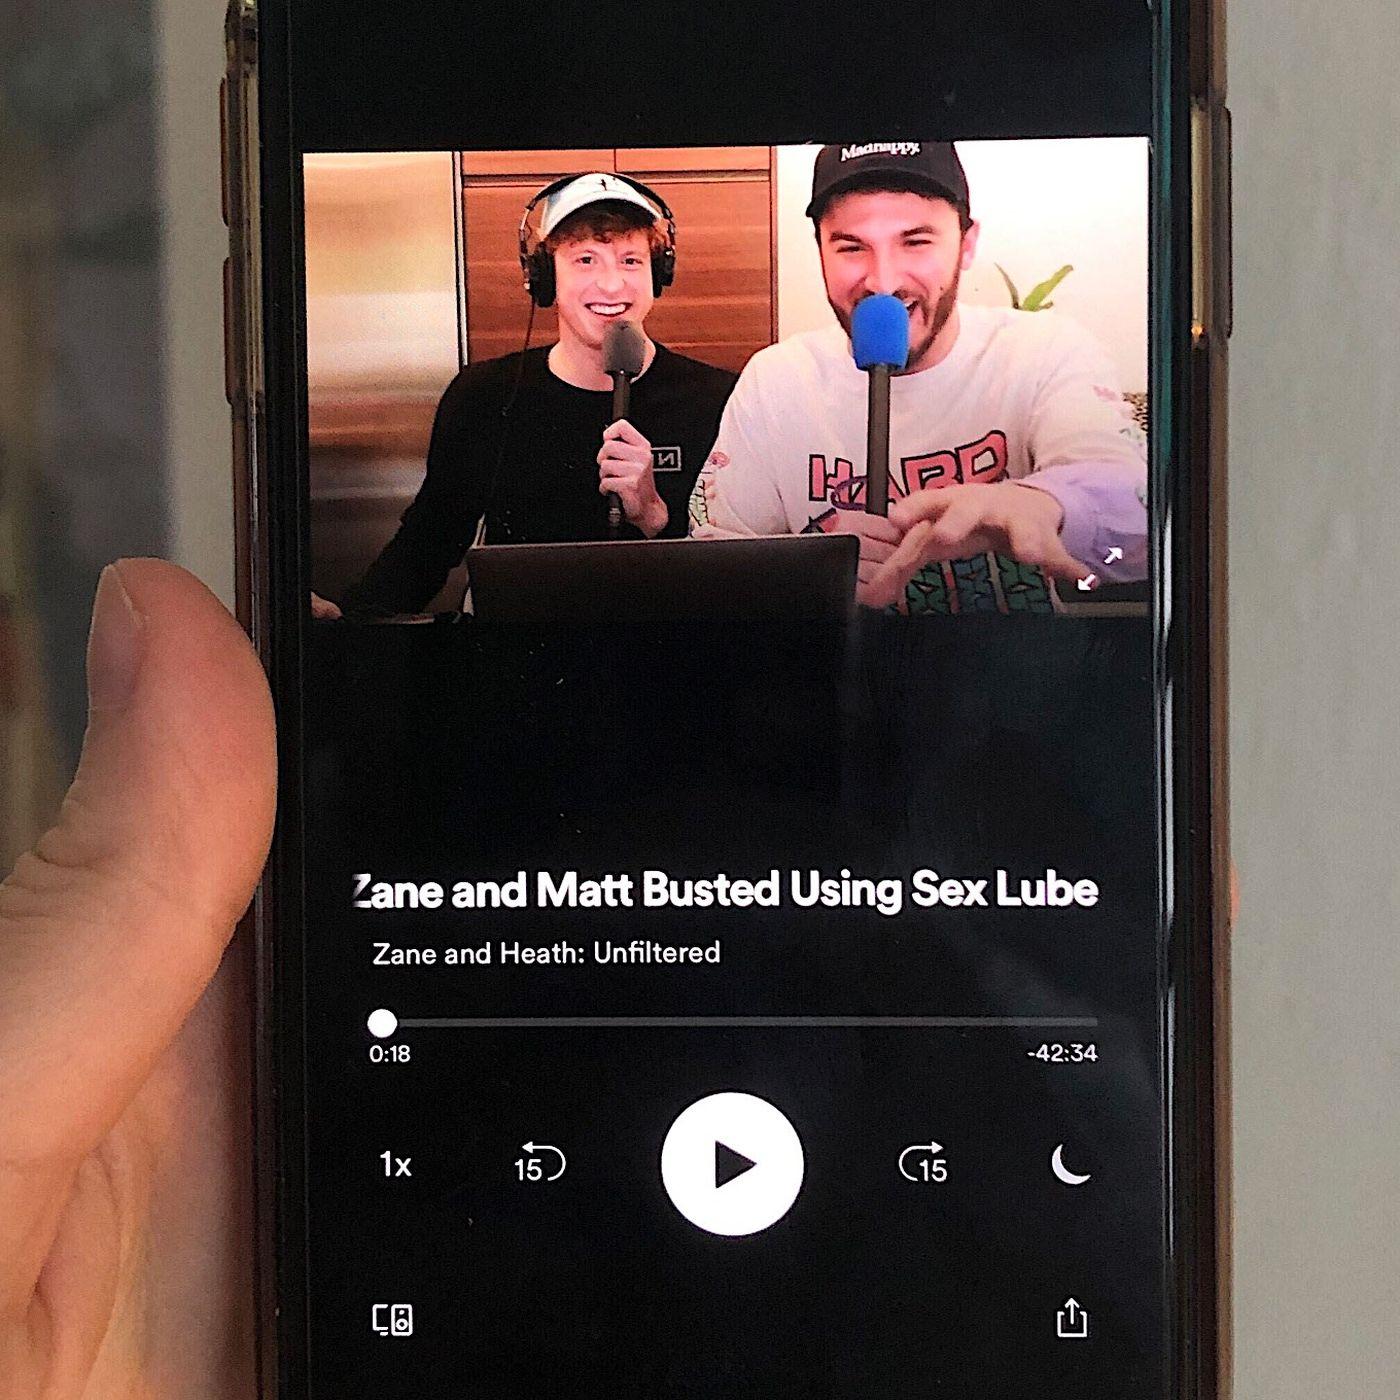 Spotify Clips تشبه قصص إنستاجرام لكن للفنانين فقط